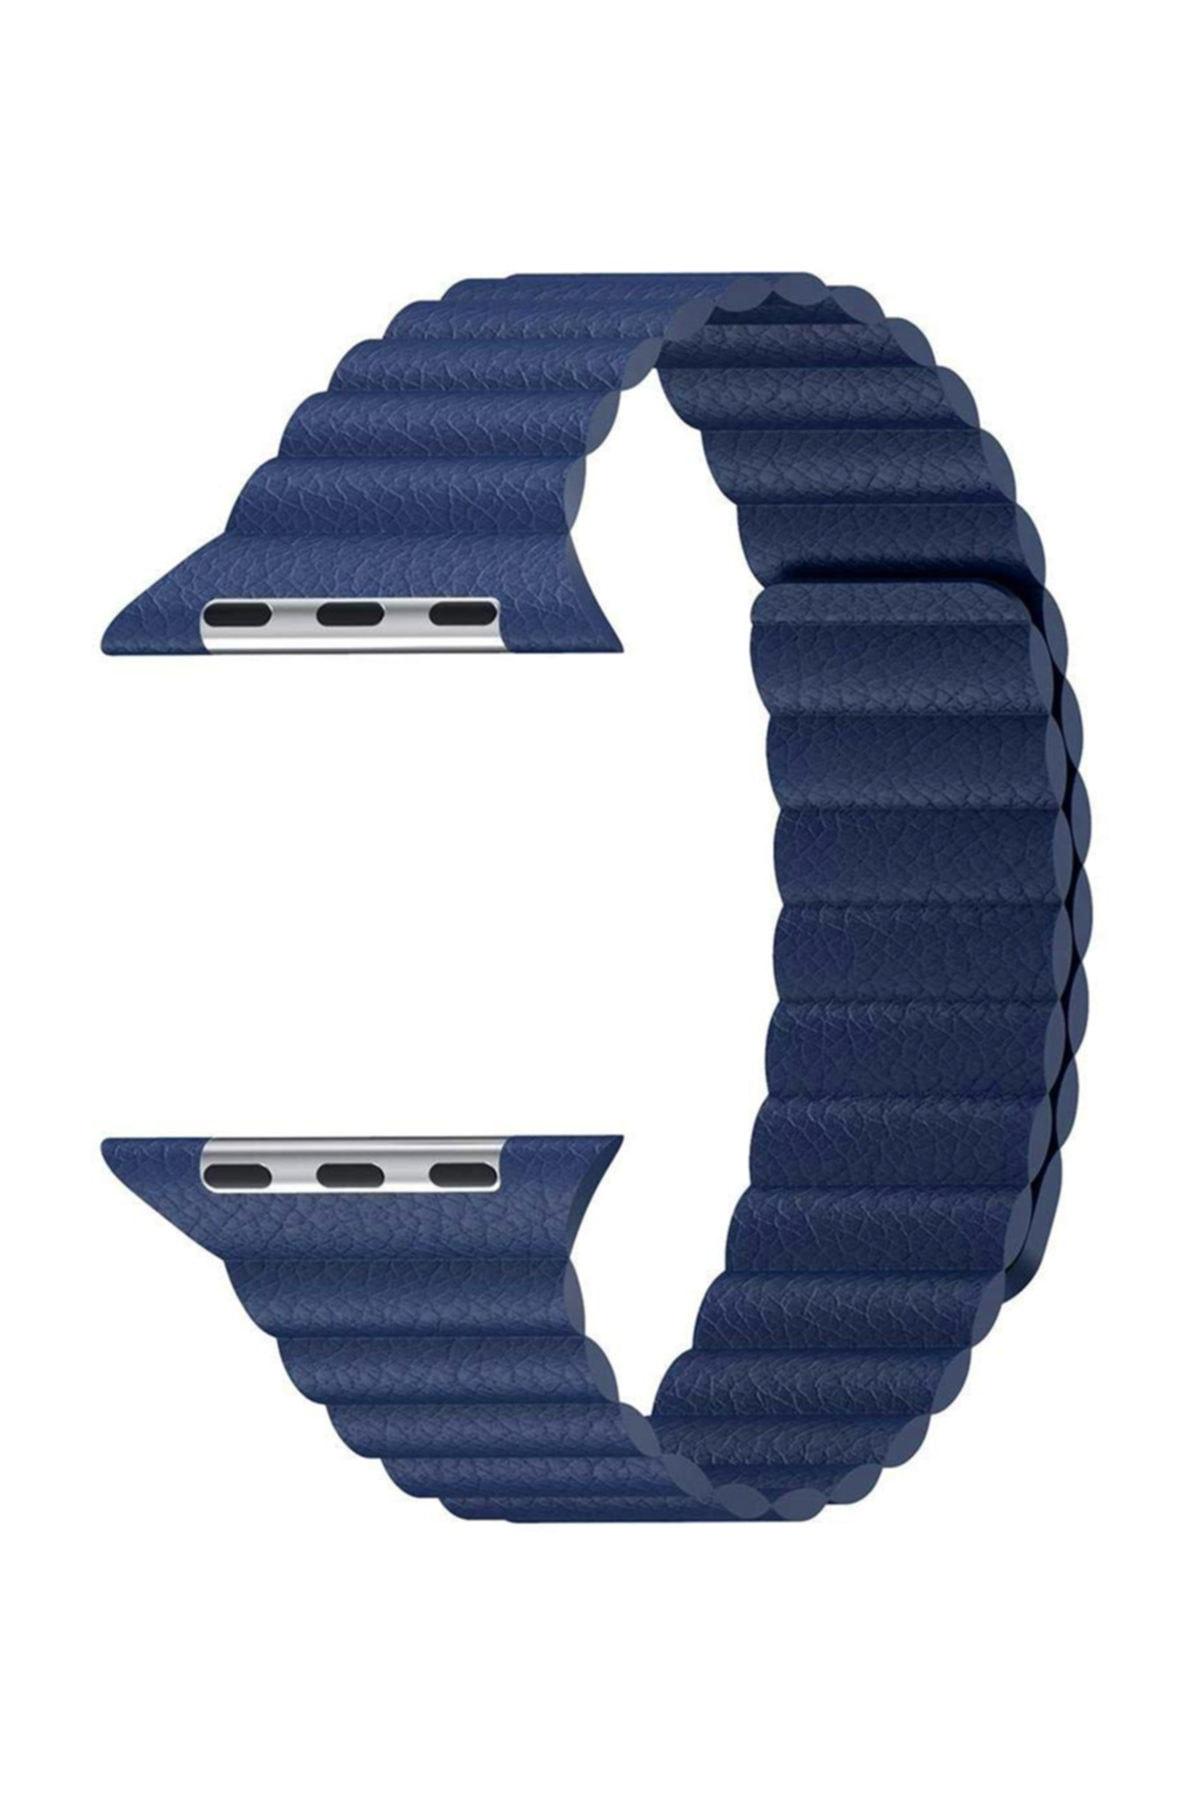 Telefon Aksesuarları Watch Series 5 44mm Twist Leather Loop Kordon, Microsonic Lacivert 2